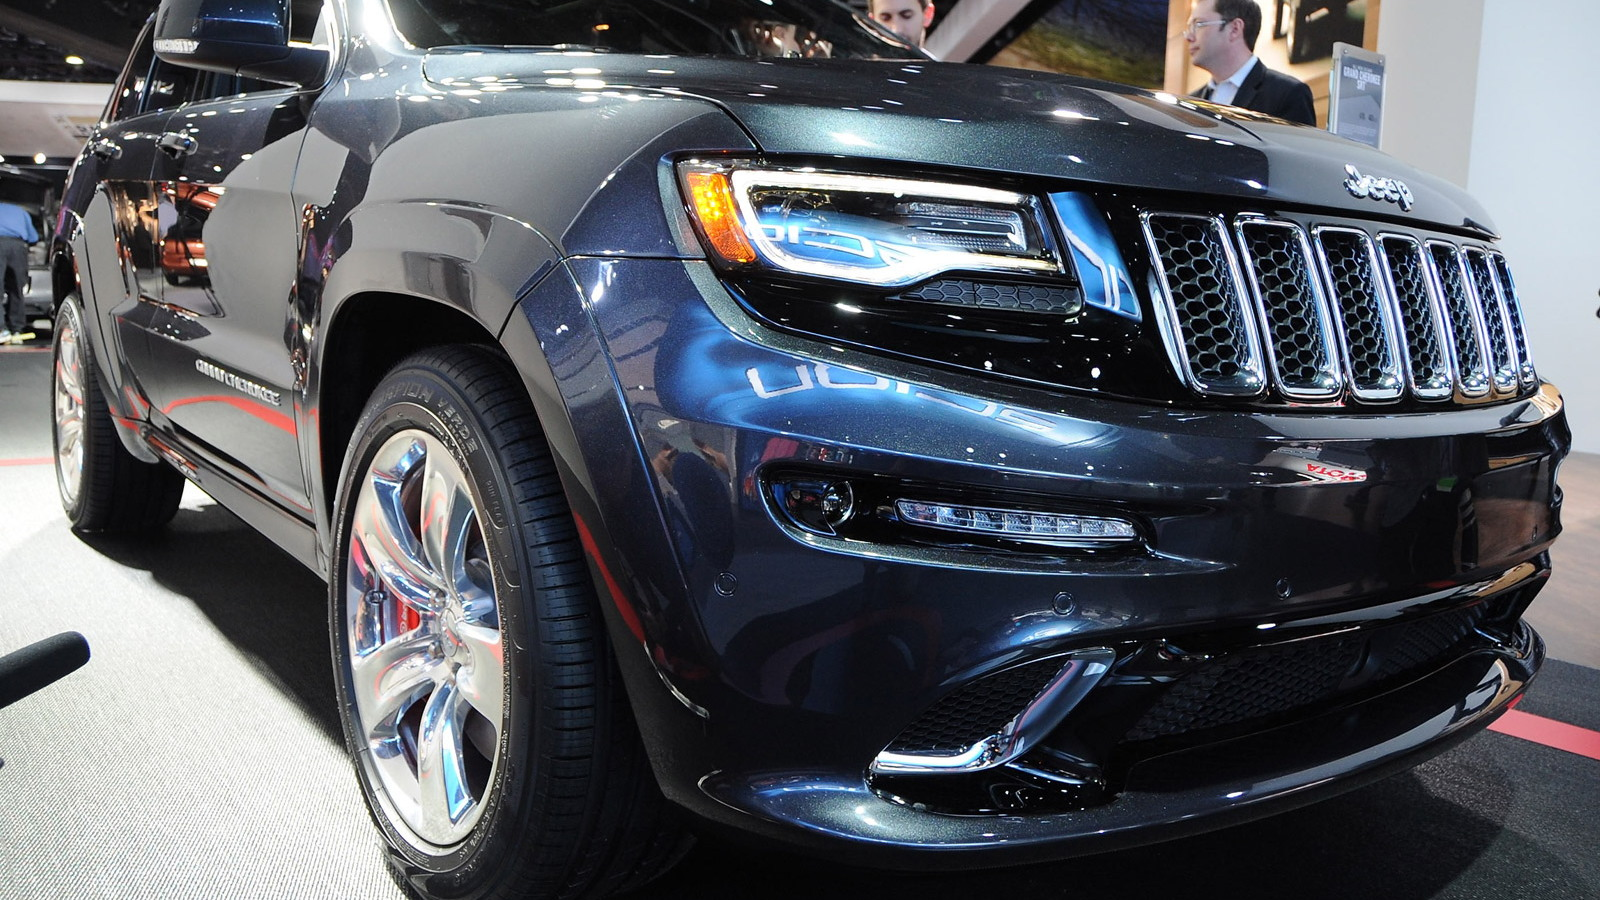 2014 Jeep Grand Cherokee SRT - 2013 Detroit Auto Show